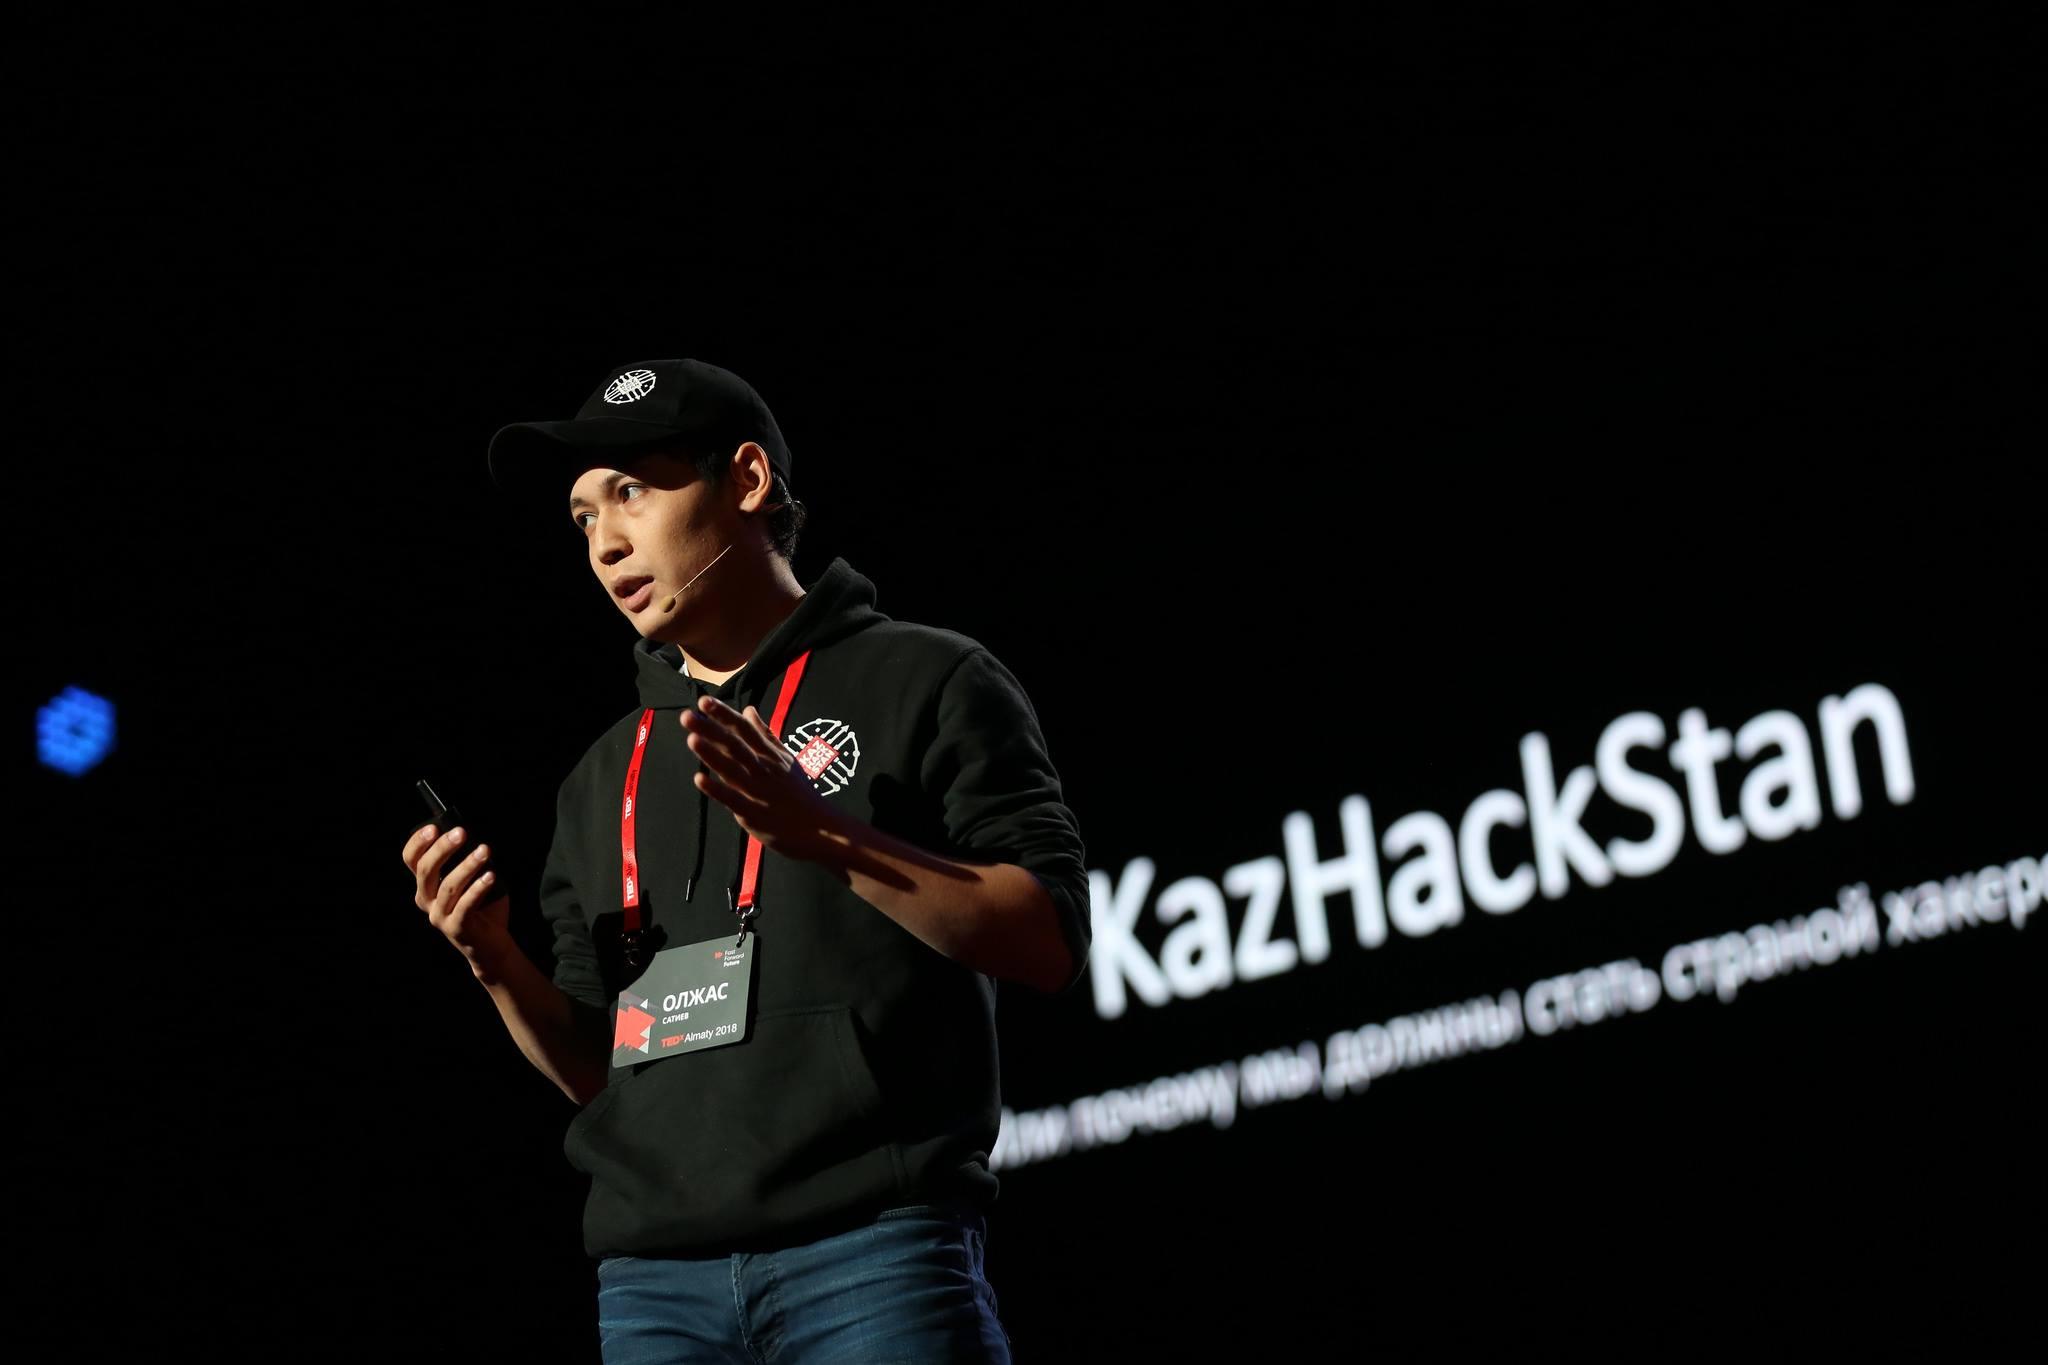 54437435 10210425114782524 646900552420032512 o Olzhas Satiyev 1 хакеры хакеры